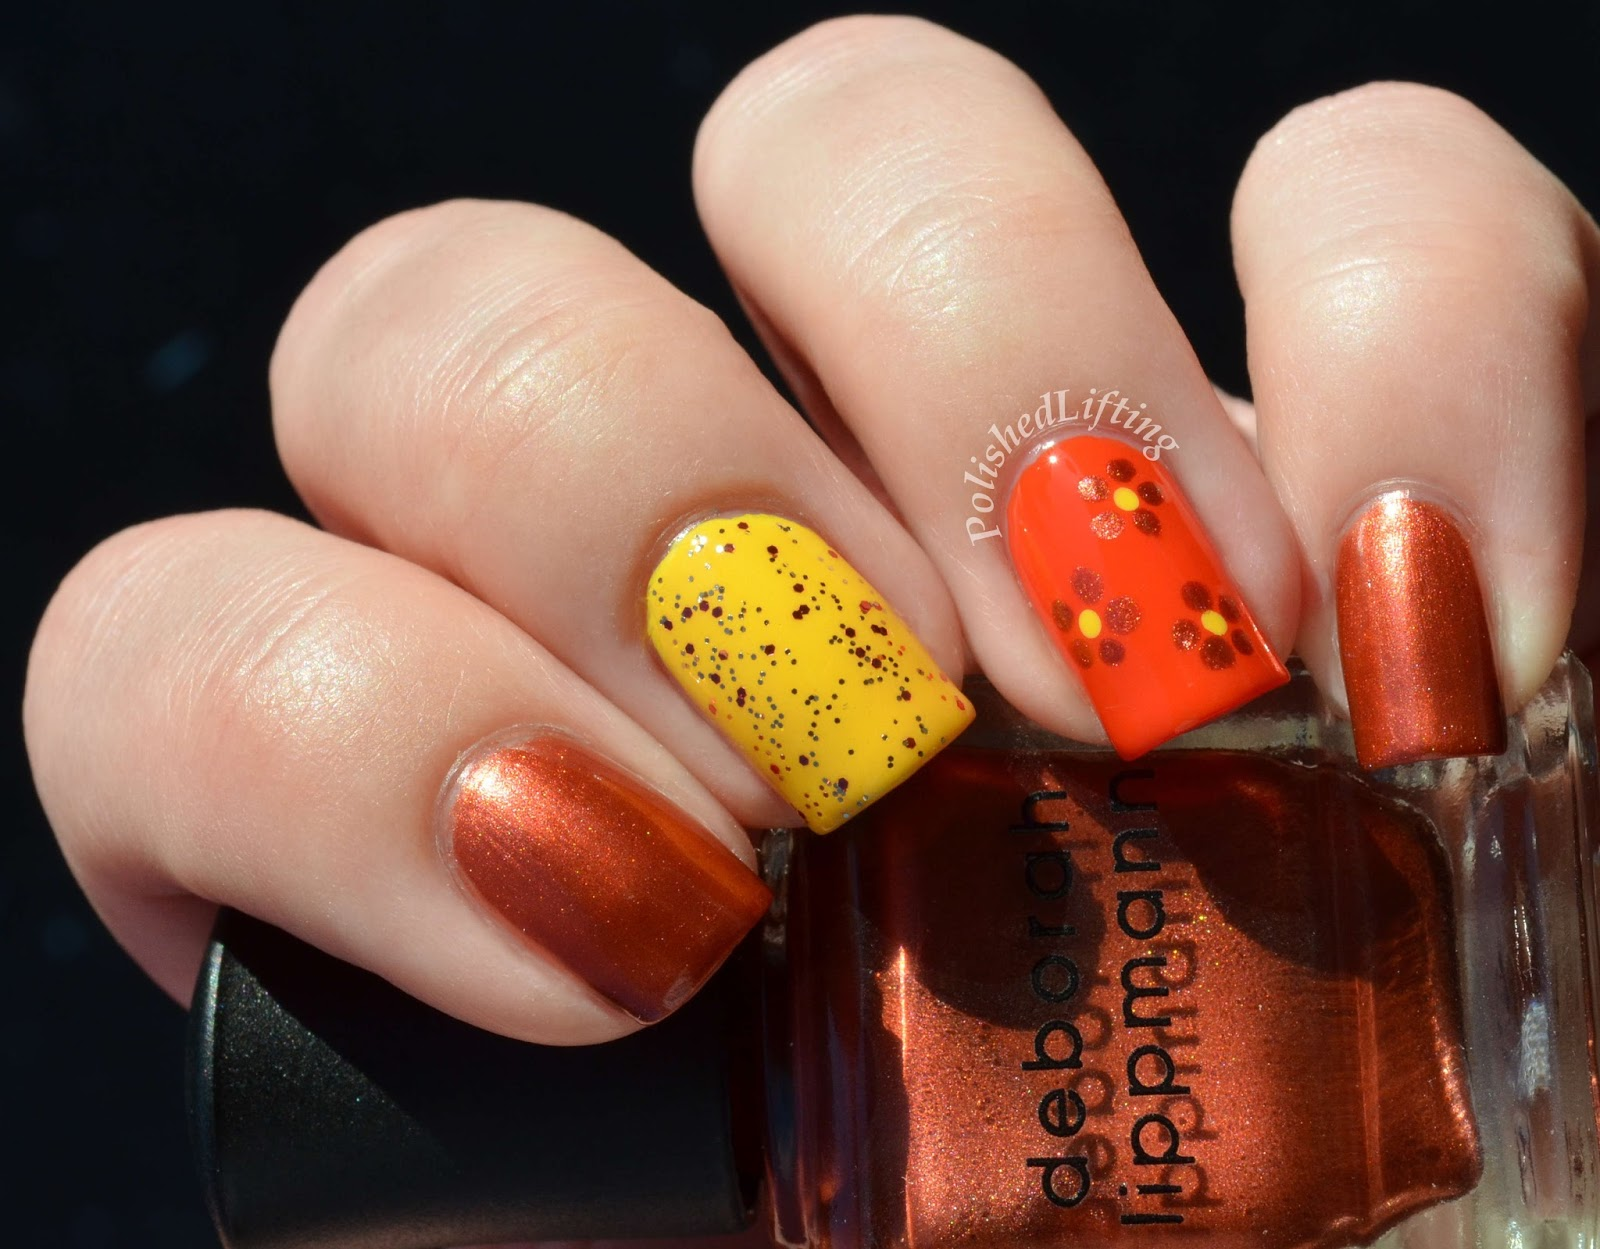 Deborah Lippmann Brick House Walking on Sunshine Don't Stop Believin' Sinful Colors Pumpkin Spice